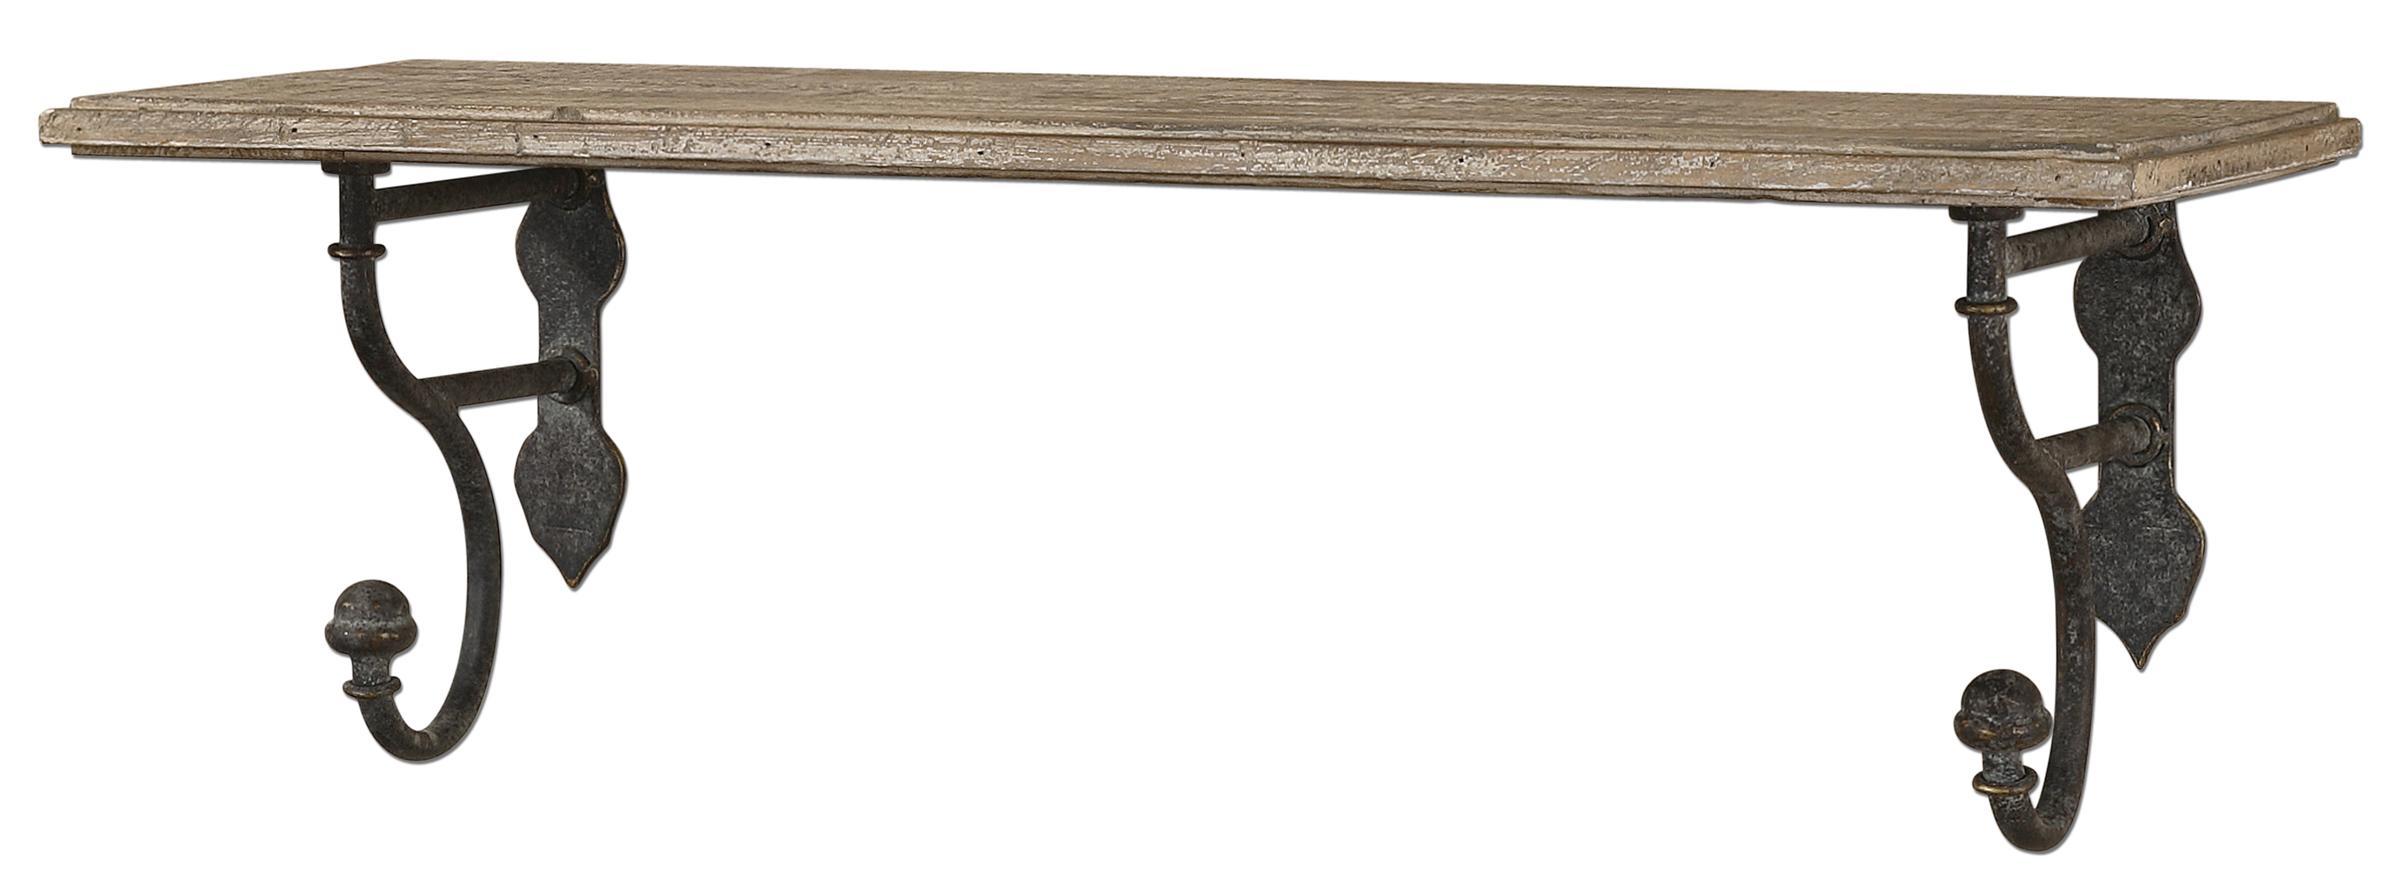 Uttermost Alternative Wall Decor Gualdo Shelf - Item Number: 13824